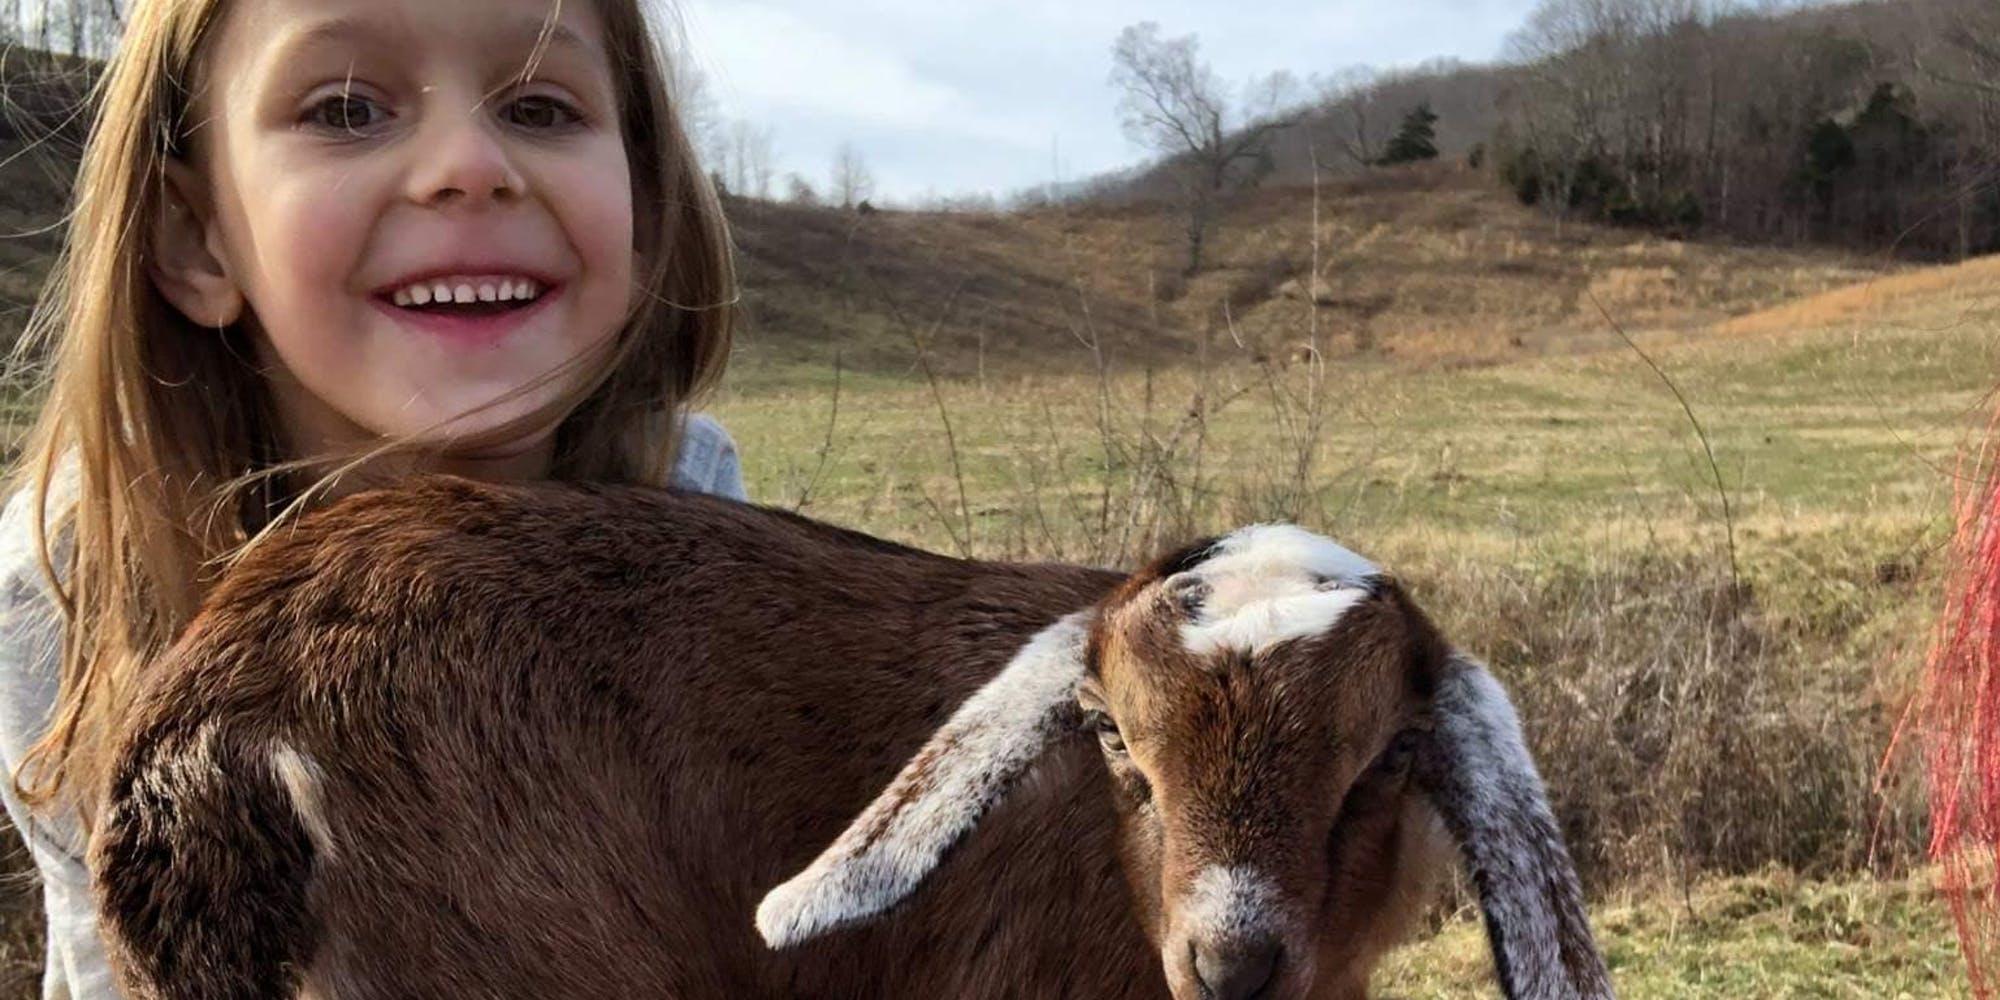 Friendly Farm  1104 Rebel Hollow Rd, Tazewell, Tennessee 37879